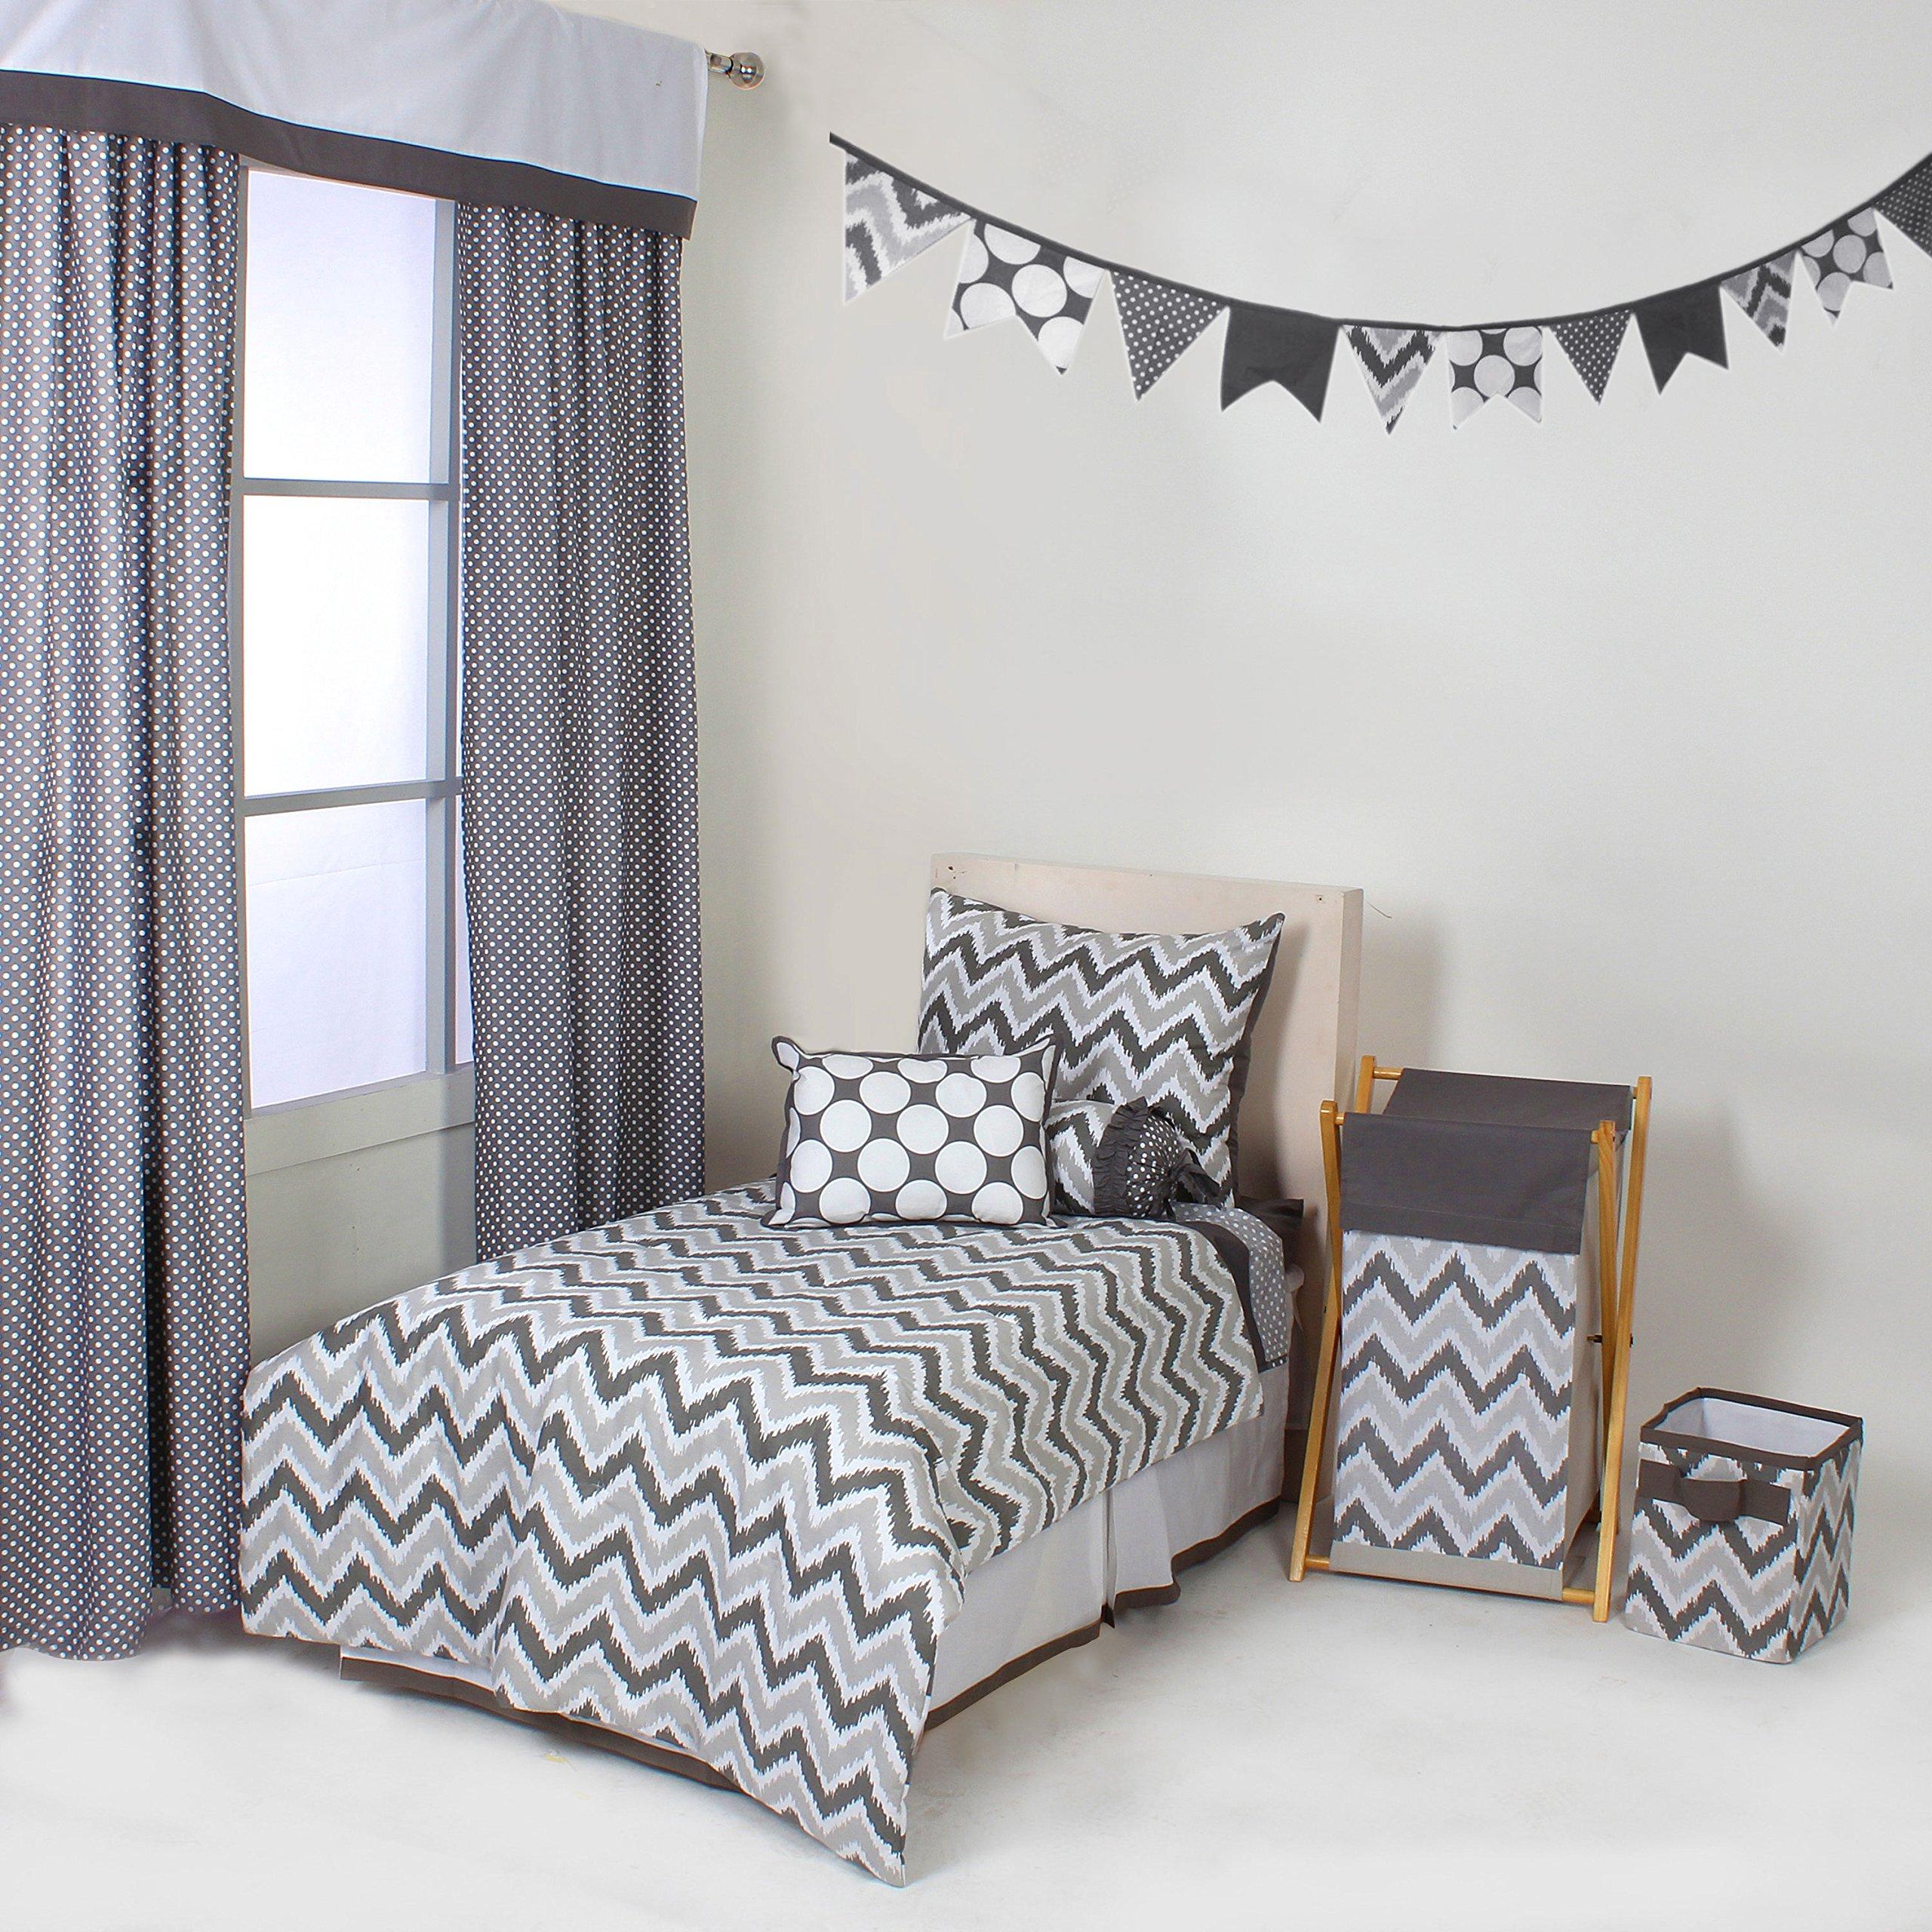 Bacati Mix and Match 4 Piece Toddler Bedding Set, Grey